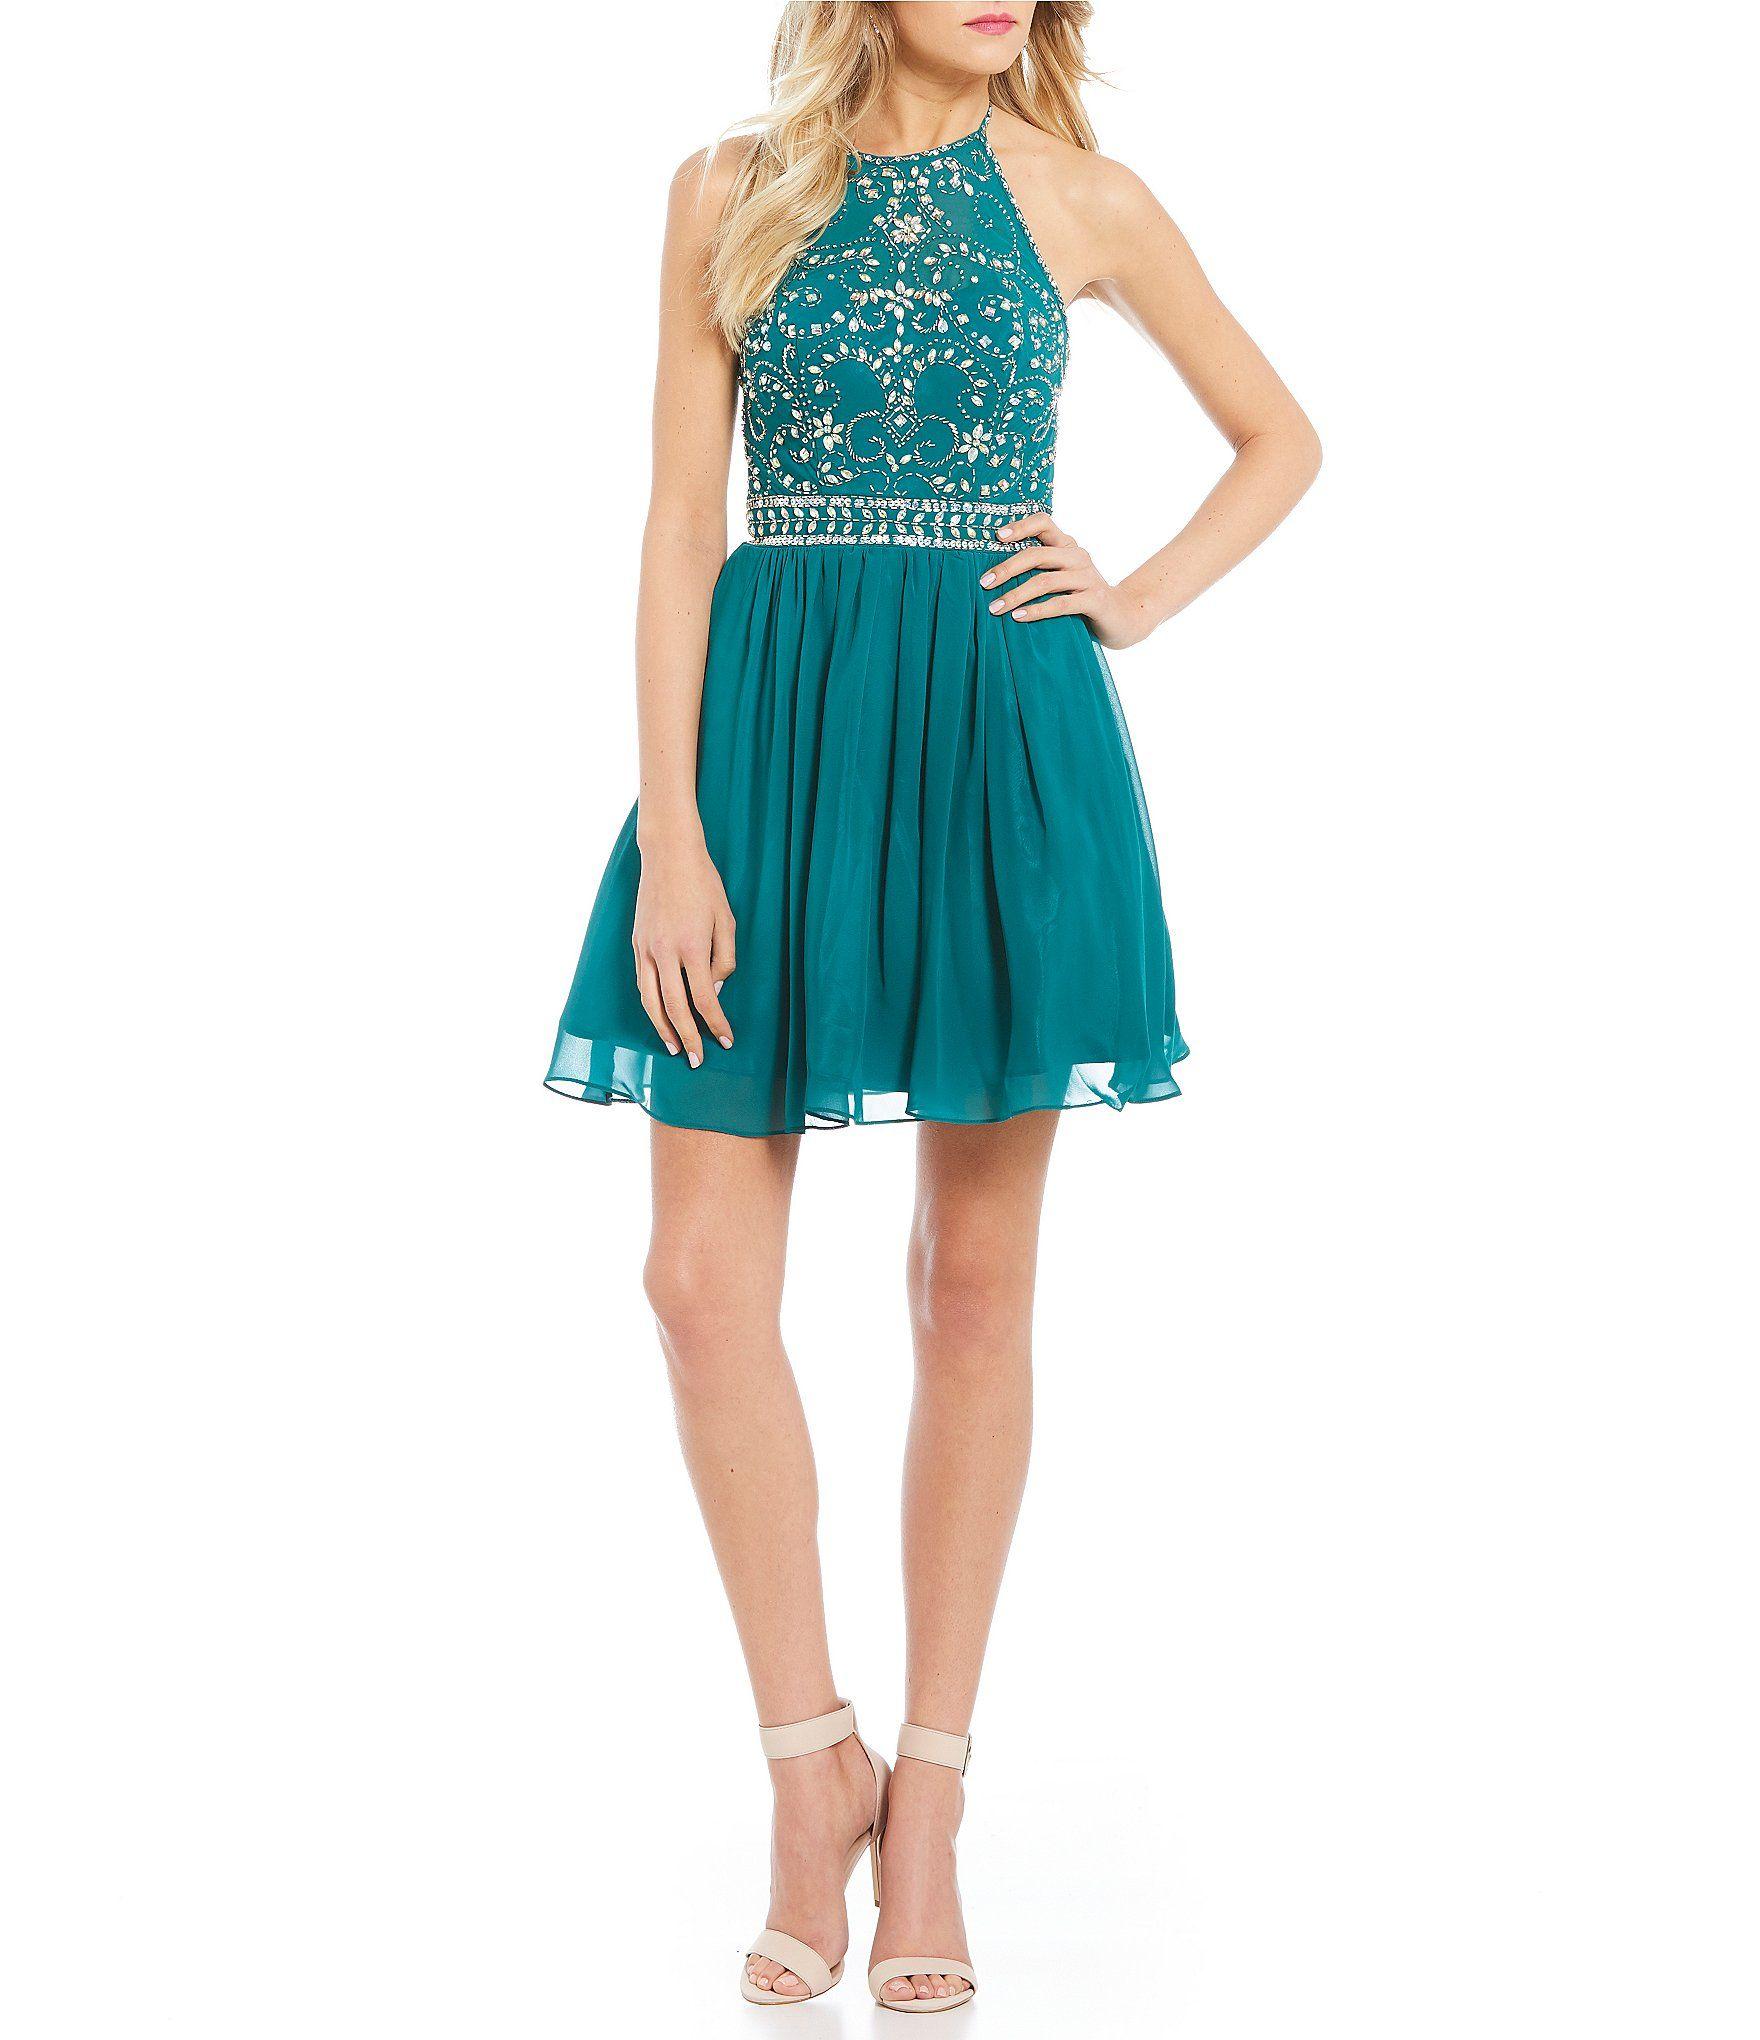 B. Darlin Halter Neckline Beaded Bodice Party Dress | Bodice ...